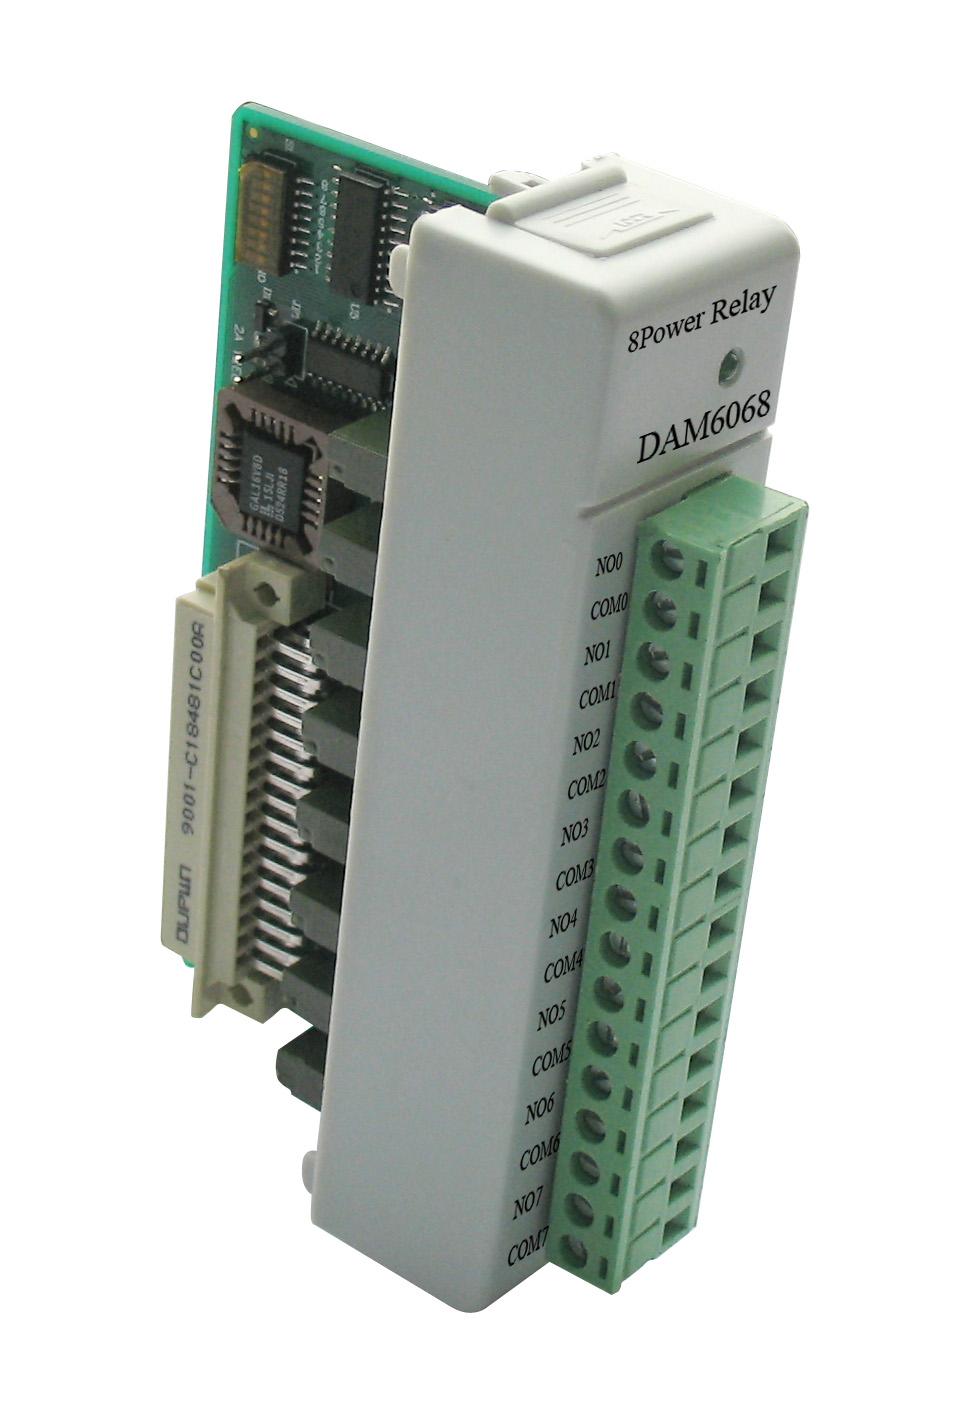 ART-阿尔泰科技DAM6068-8路继电器输出模块